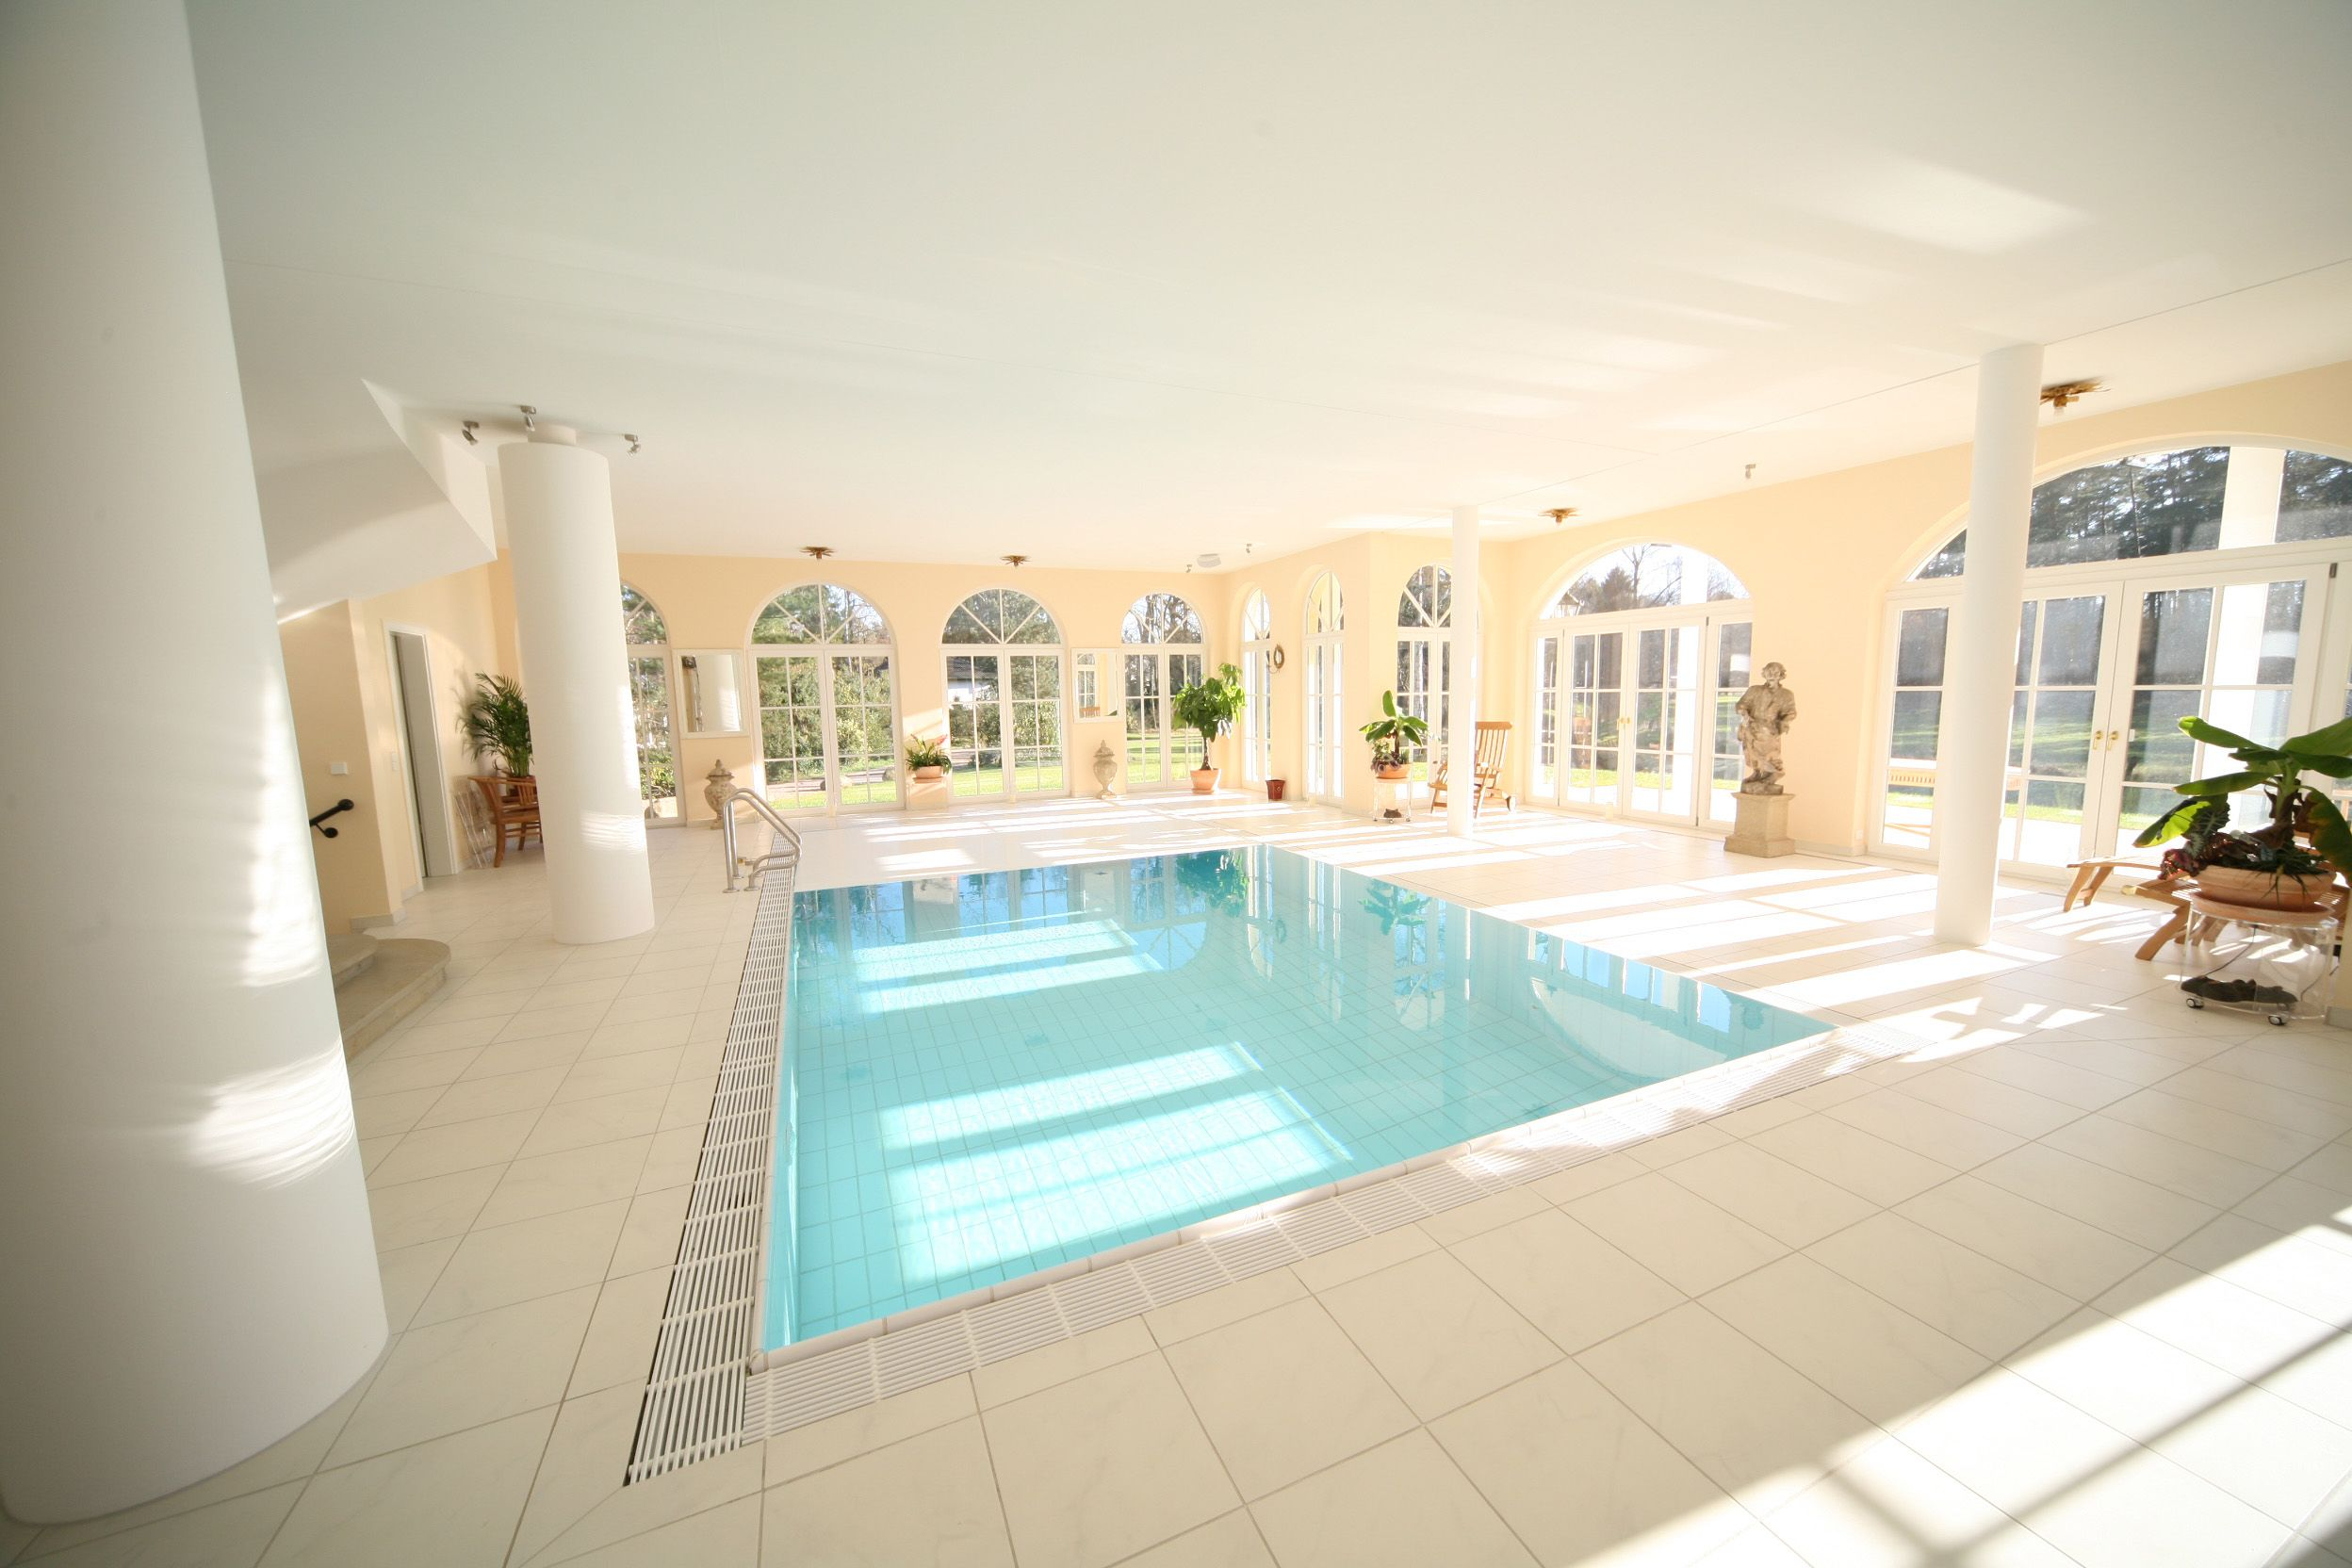 Poolbau Thüringen schwimmbad pool sopra homes pool steam